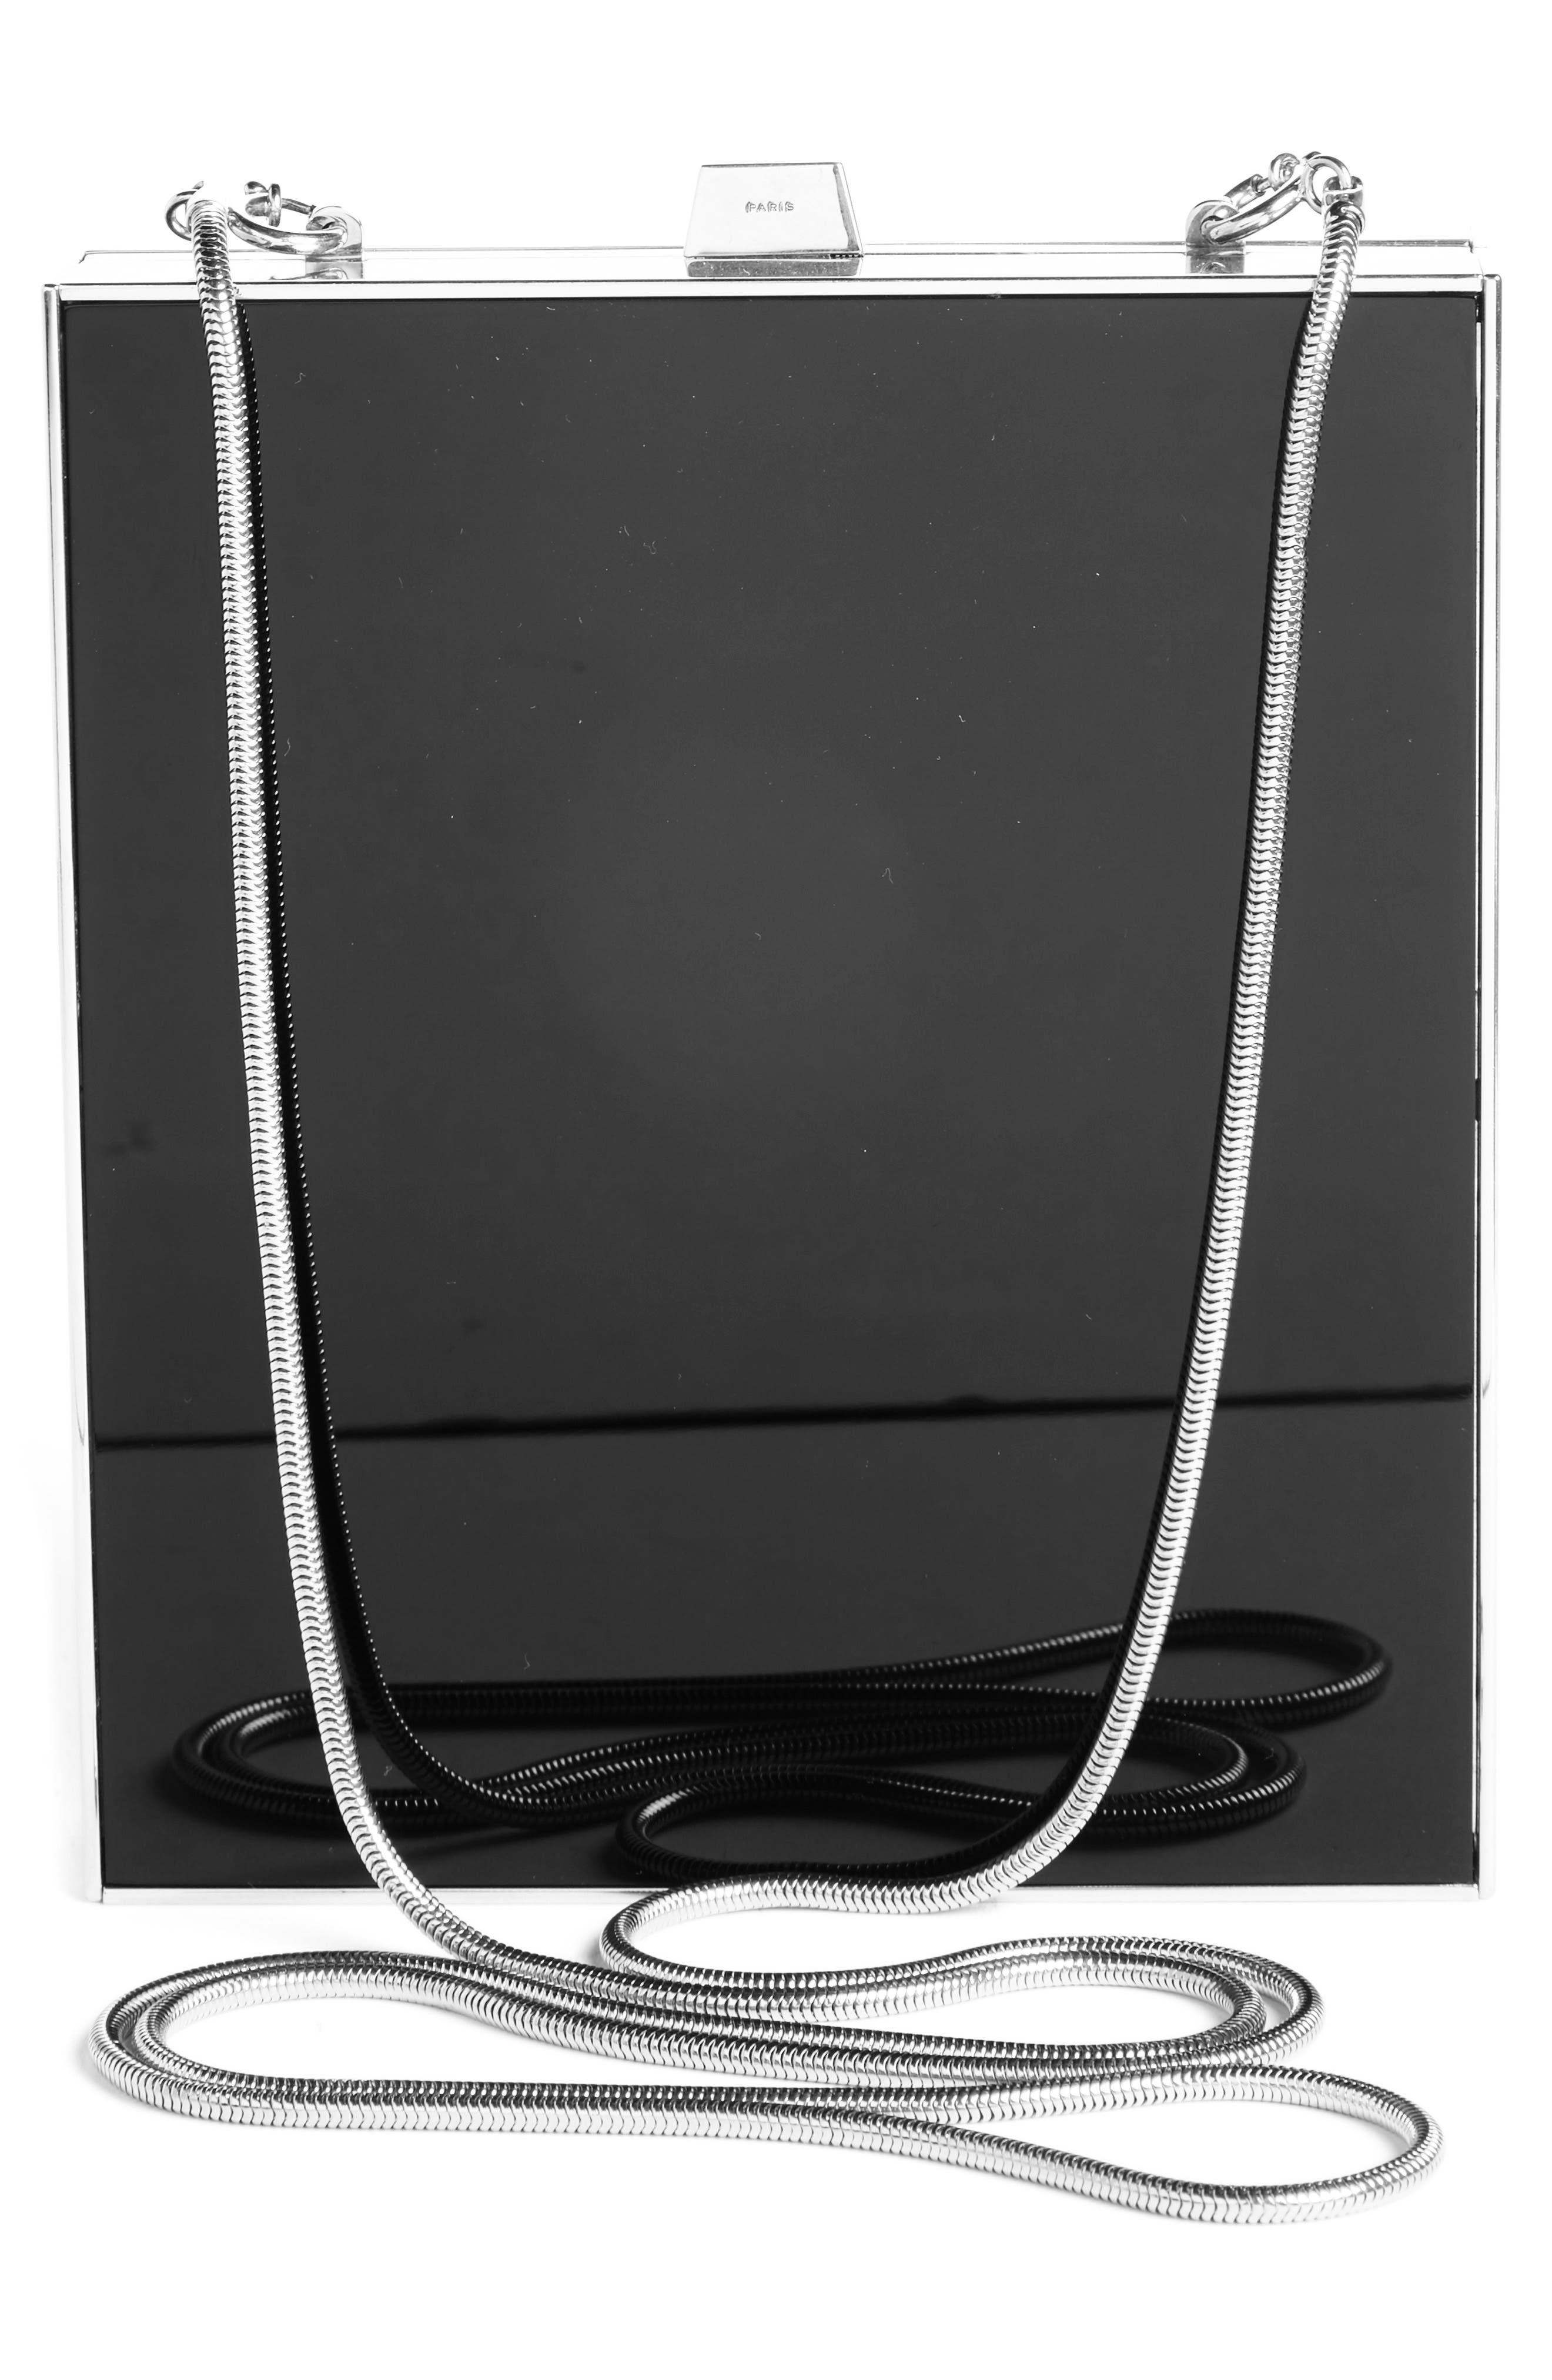 Tuxedo Plexiglass Clutch,                             Alternate thumbnail 2, color,                             Noir/ Silver